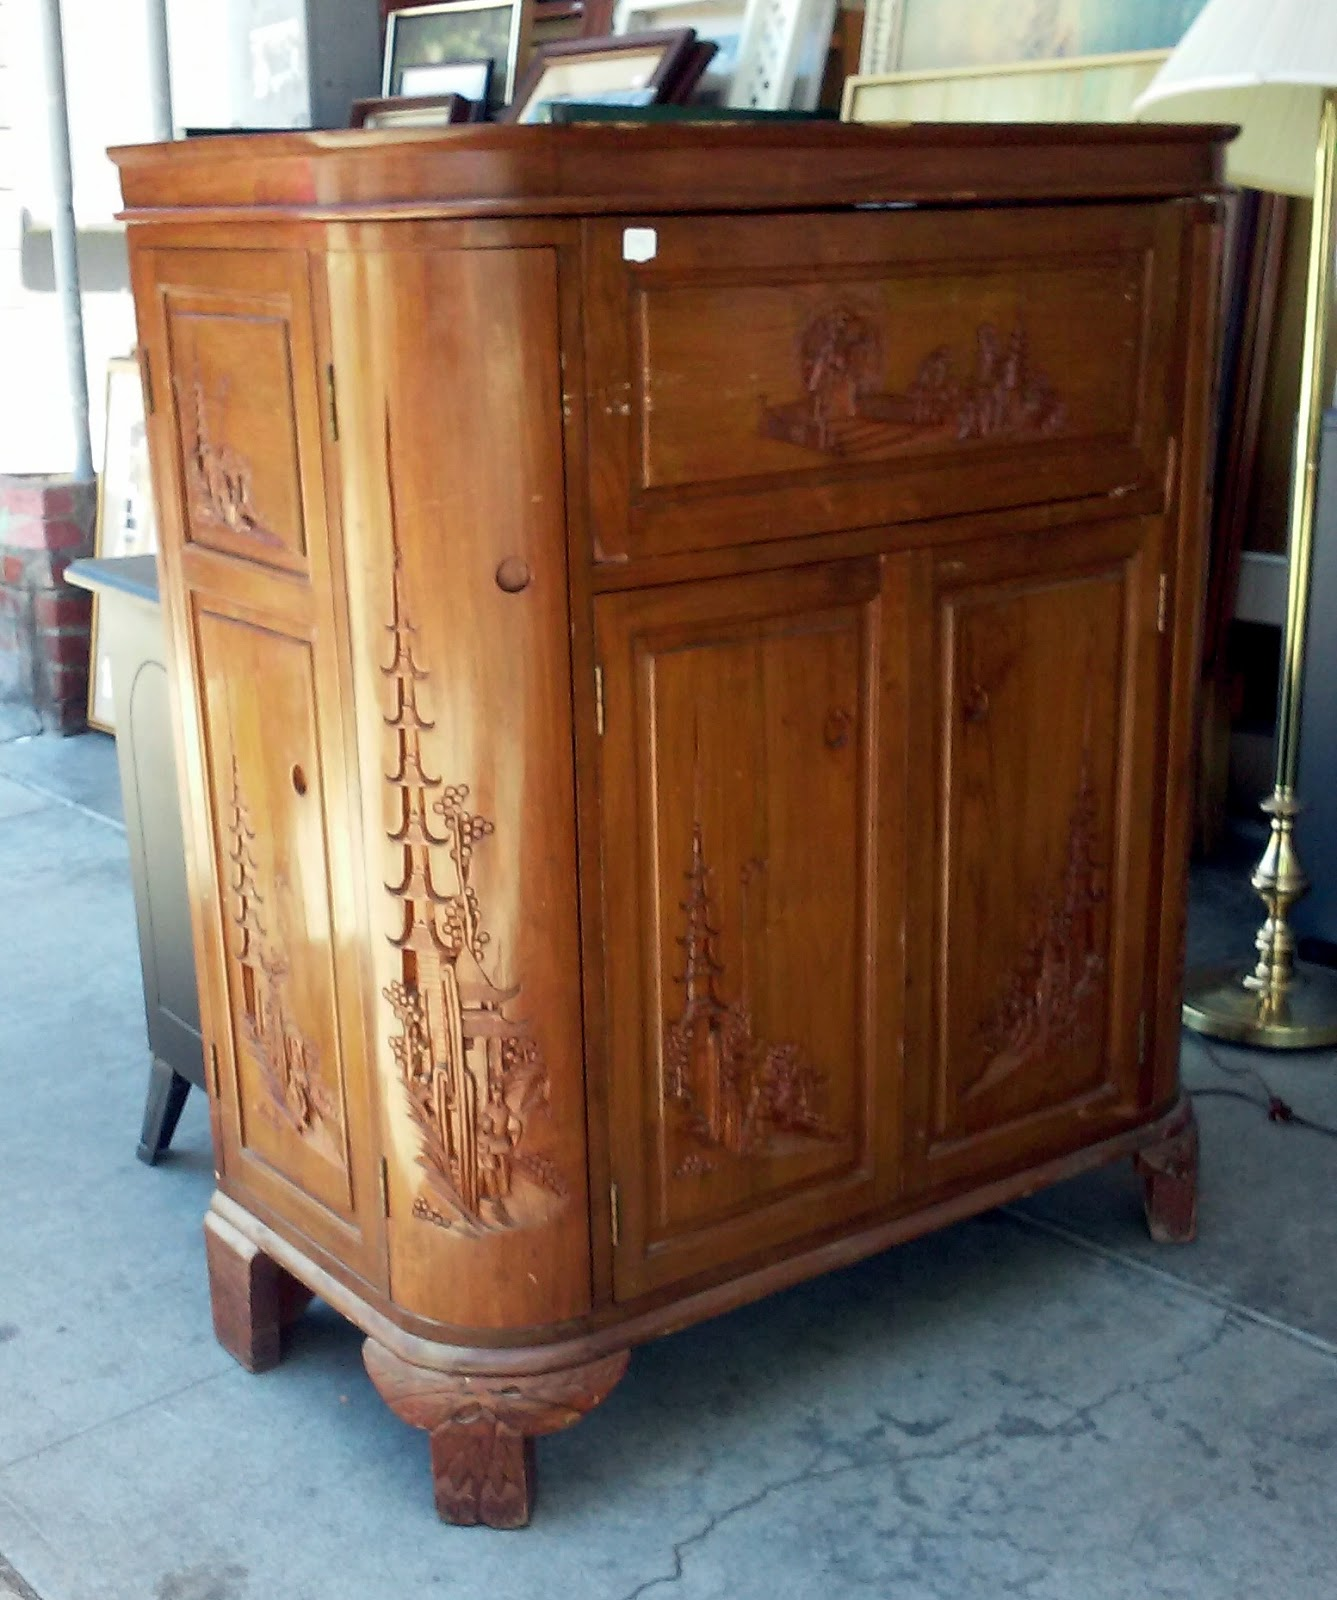 The Find Furniture: UHURU FURNITURE & COLLECTIBLES: SOLD **BARGAIN BUY** #1941